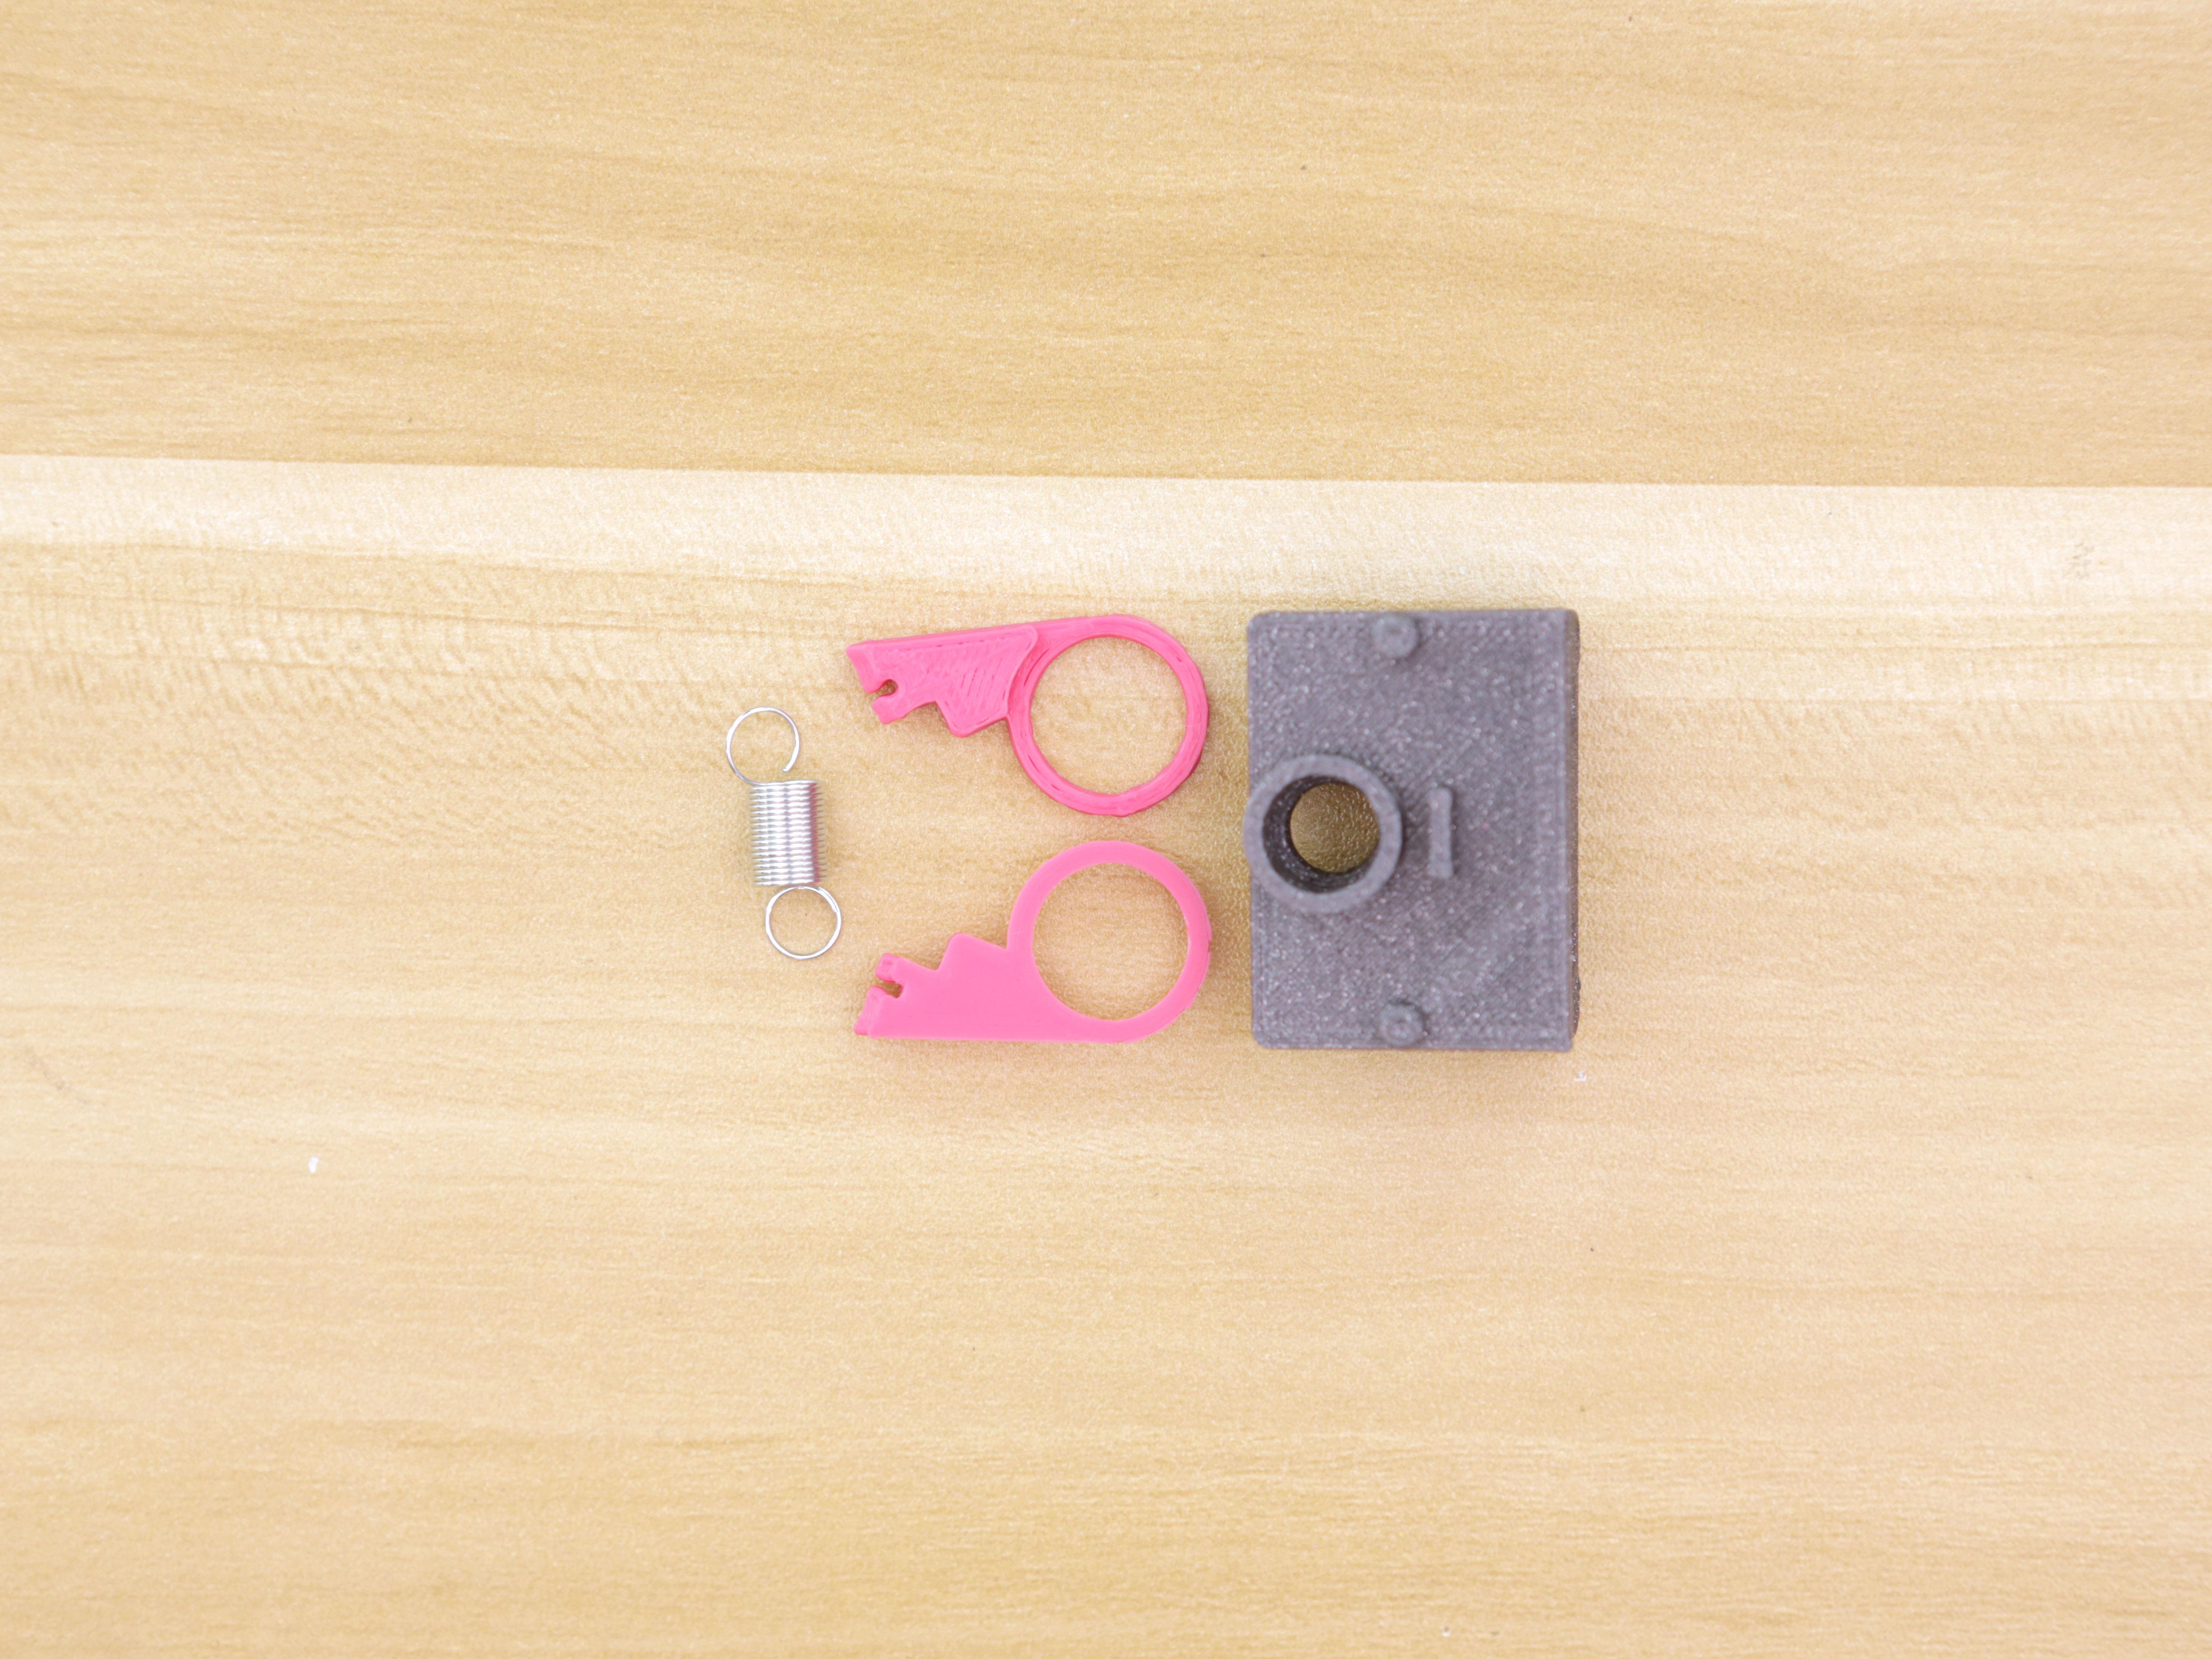 3d_printing_wmy-spring-parts.jpg